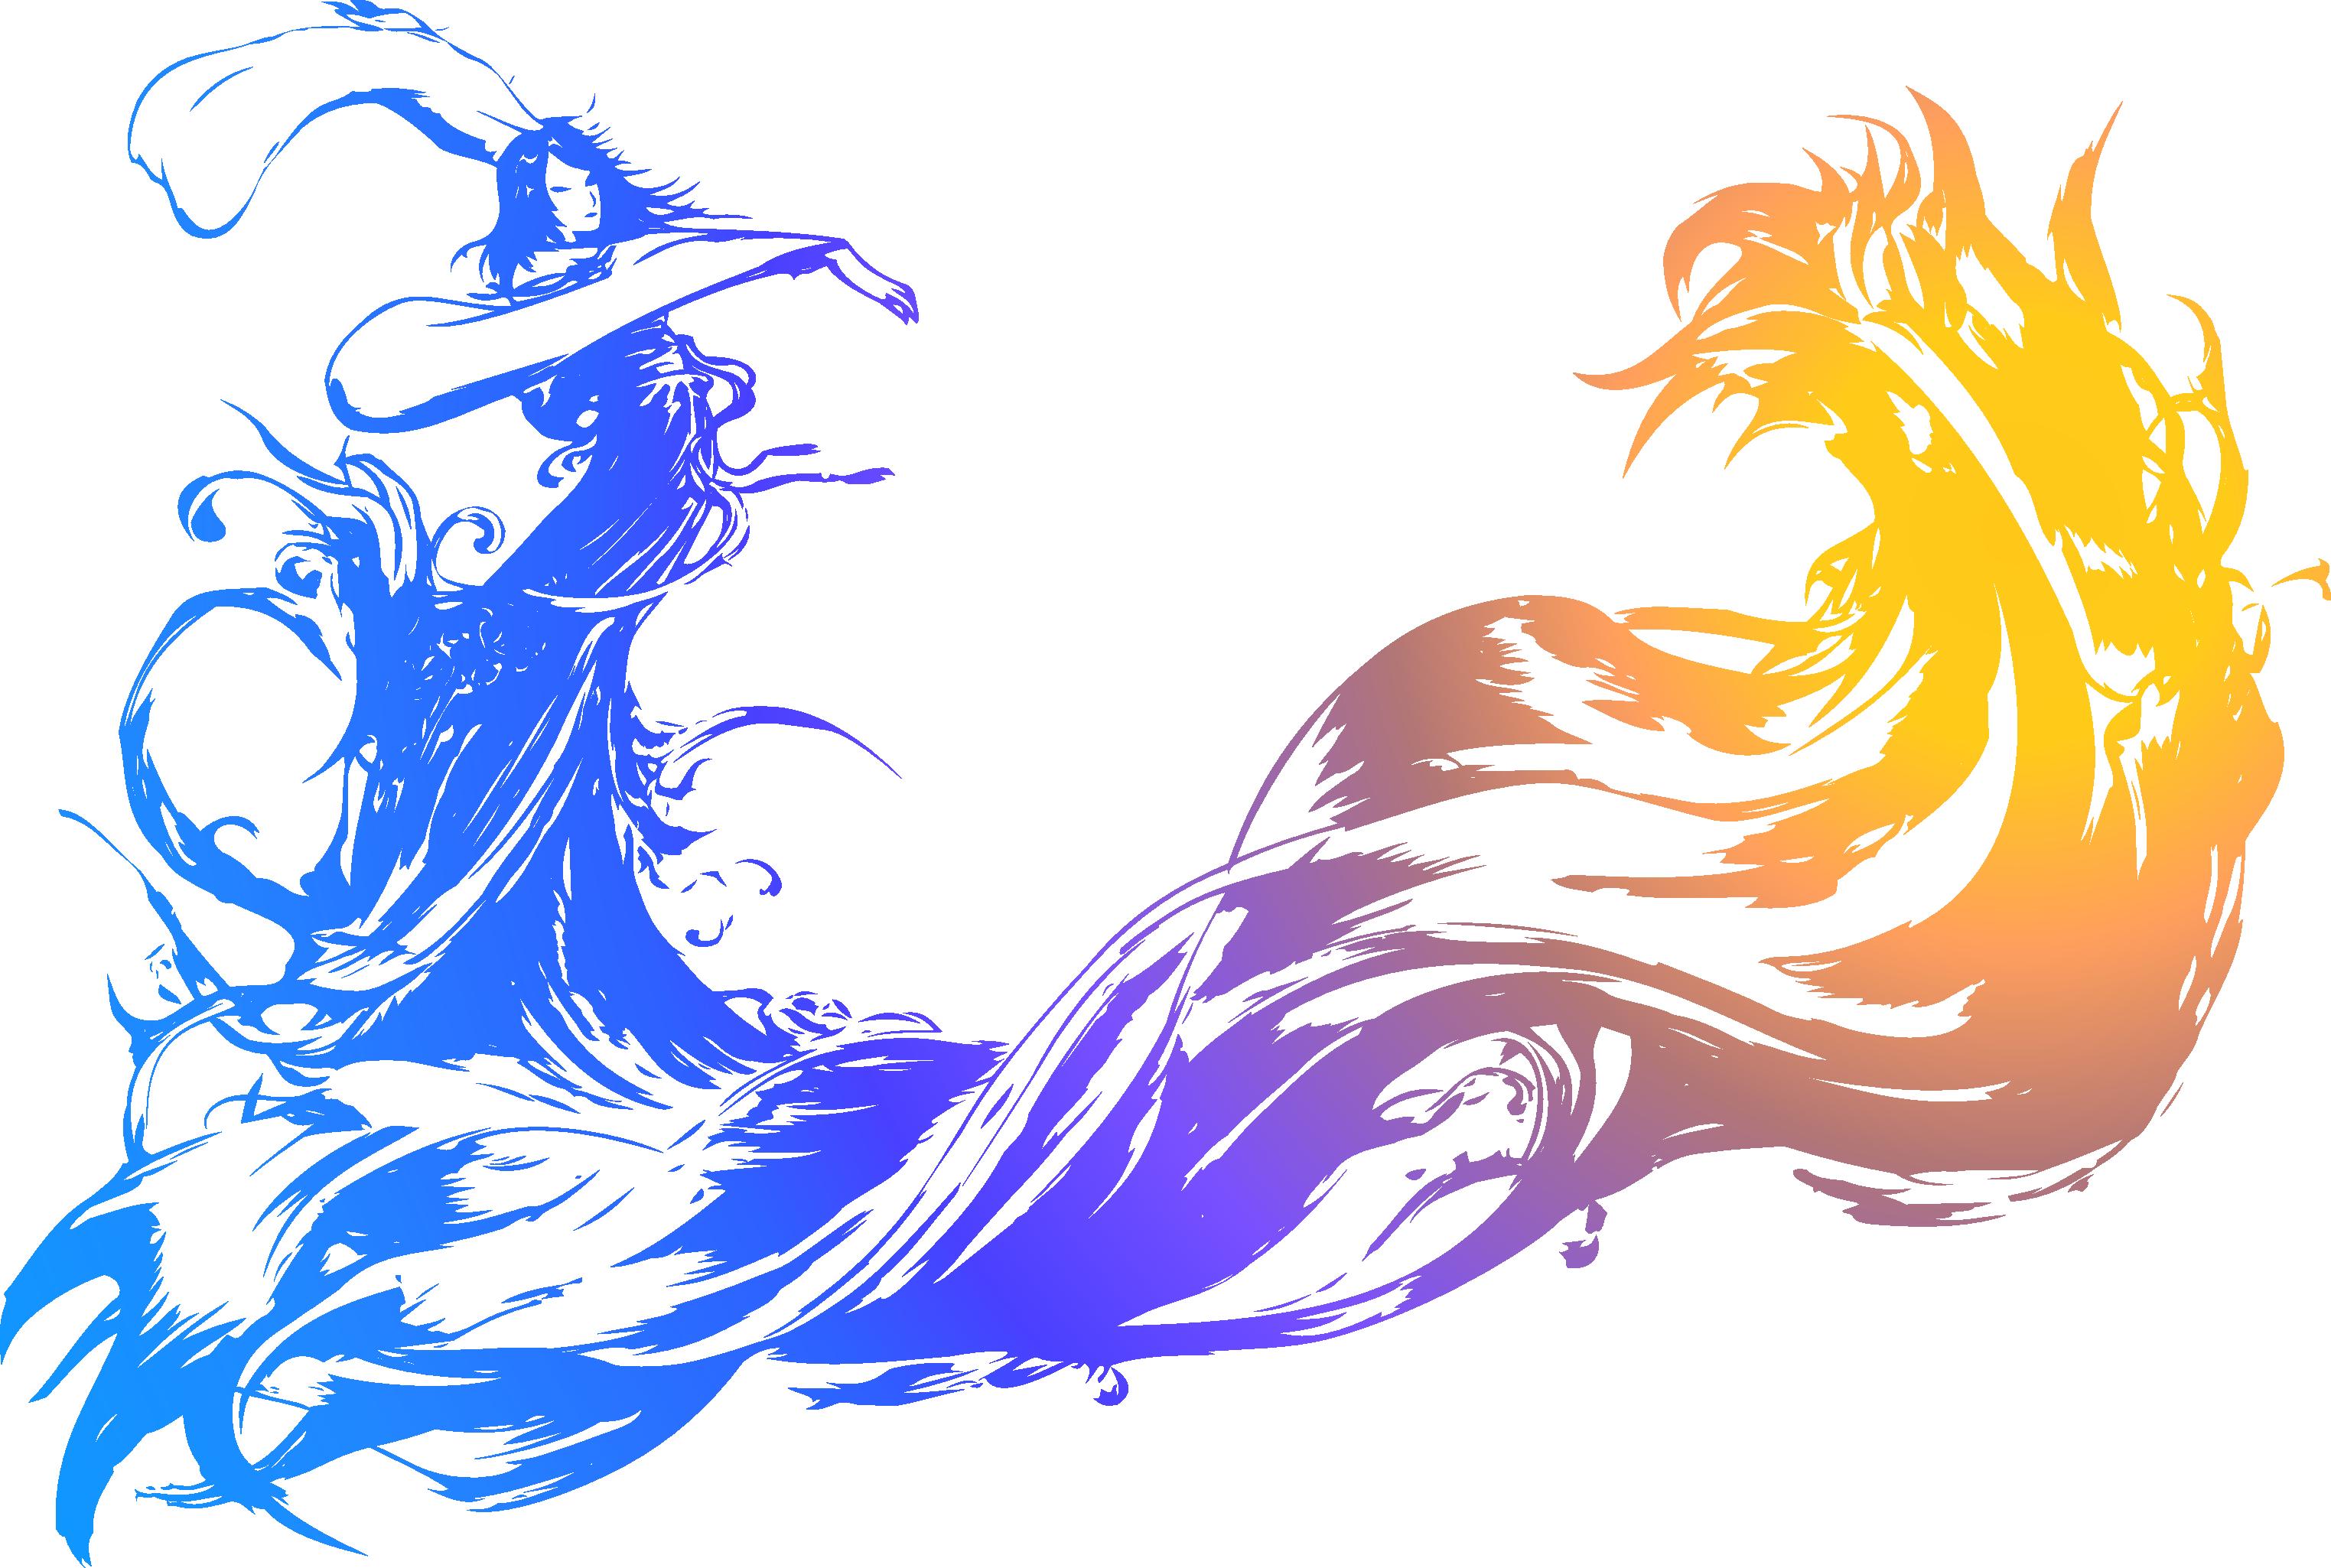 Final Fantasy X Logo By Eldi13 On Deviantart Final Fantasy Tattoo Final Fantasy Art Final Fantasy Artwork